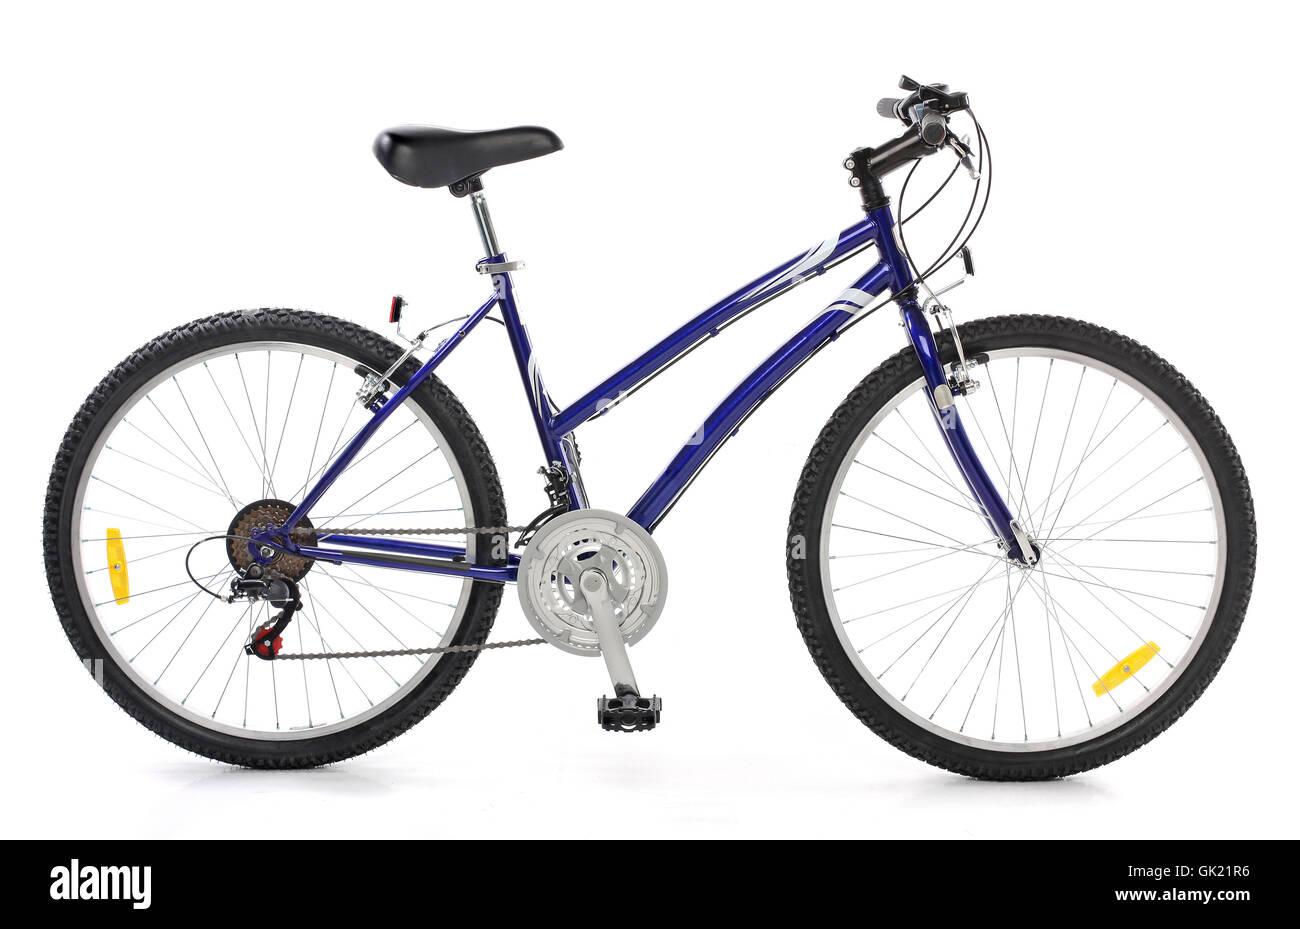 Bicicleta aislado Imagen De Stock